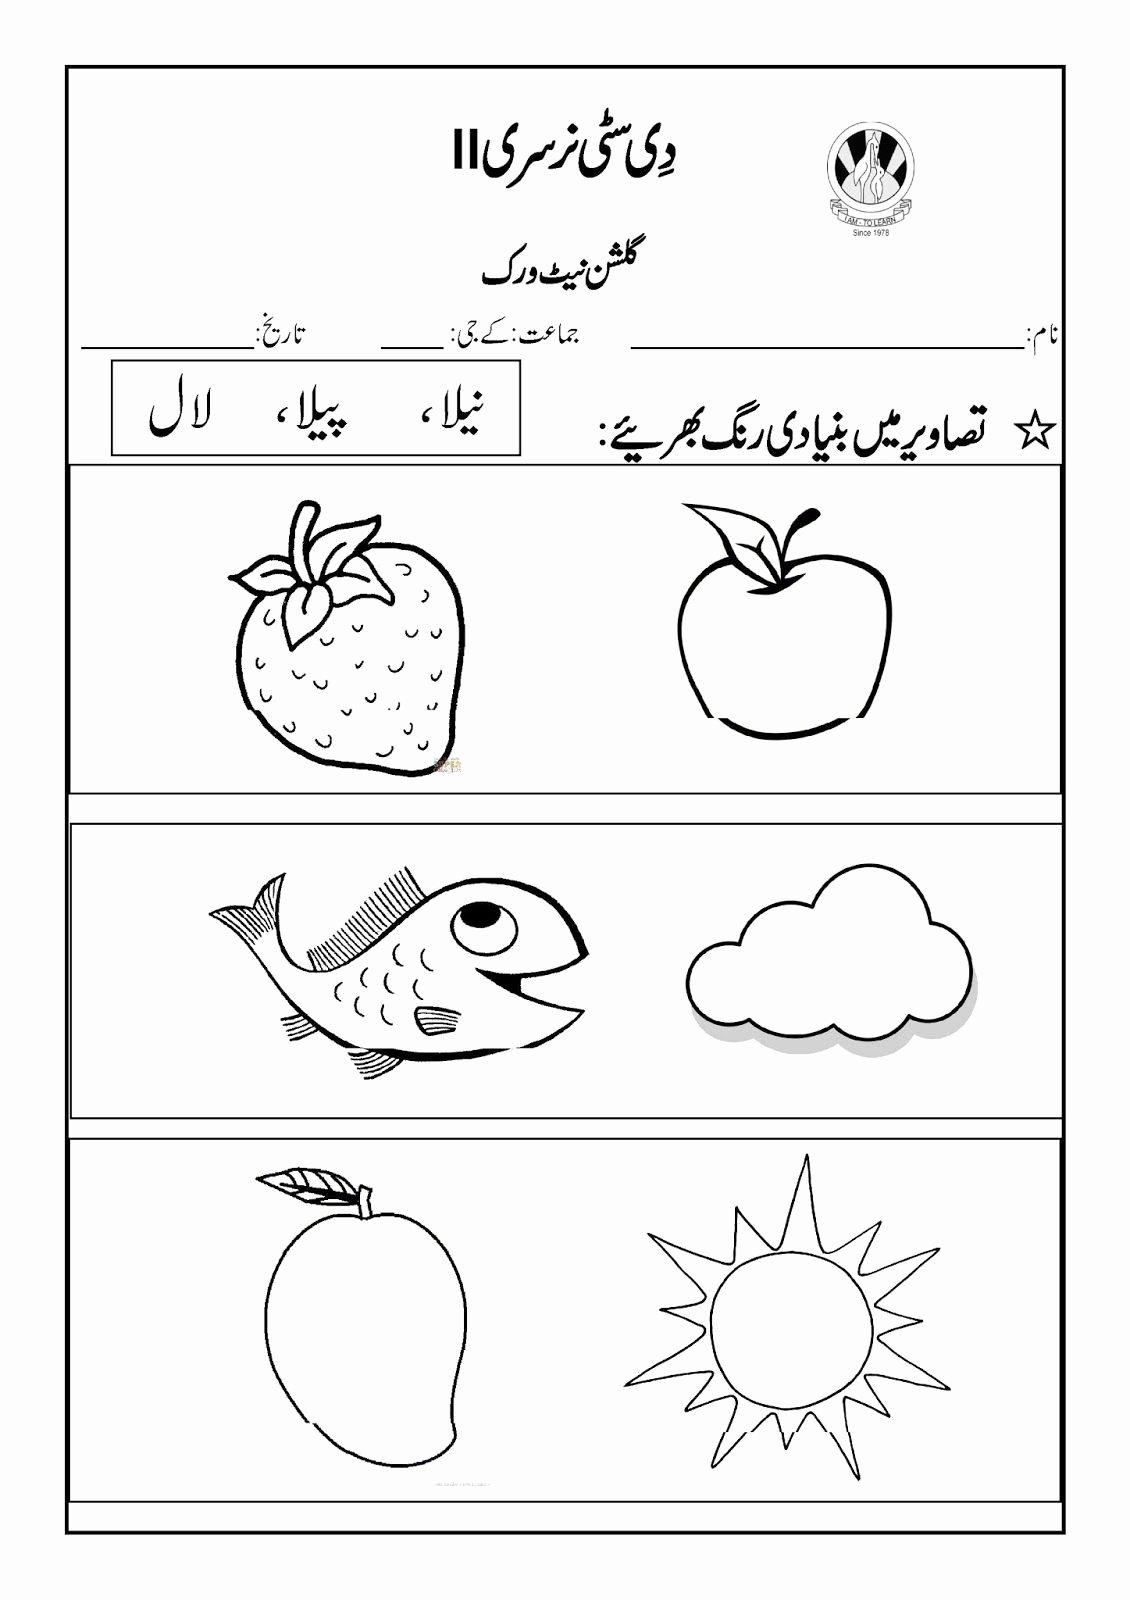 Download Urdu Worksheets for Preschoolers Awesome Image Result for Urdu Worksheets for Nursery